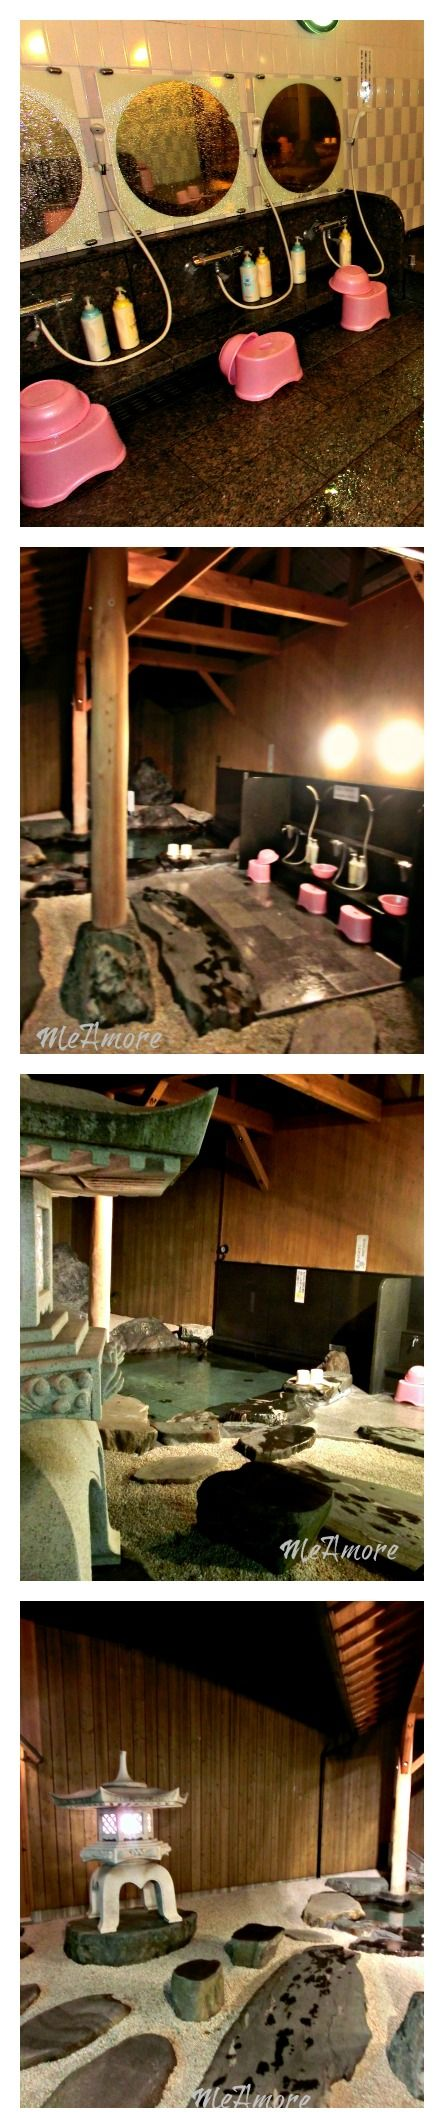 Japanese Public Bath  Onsen & Rotenburo 温泉・露天風呂